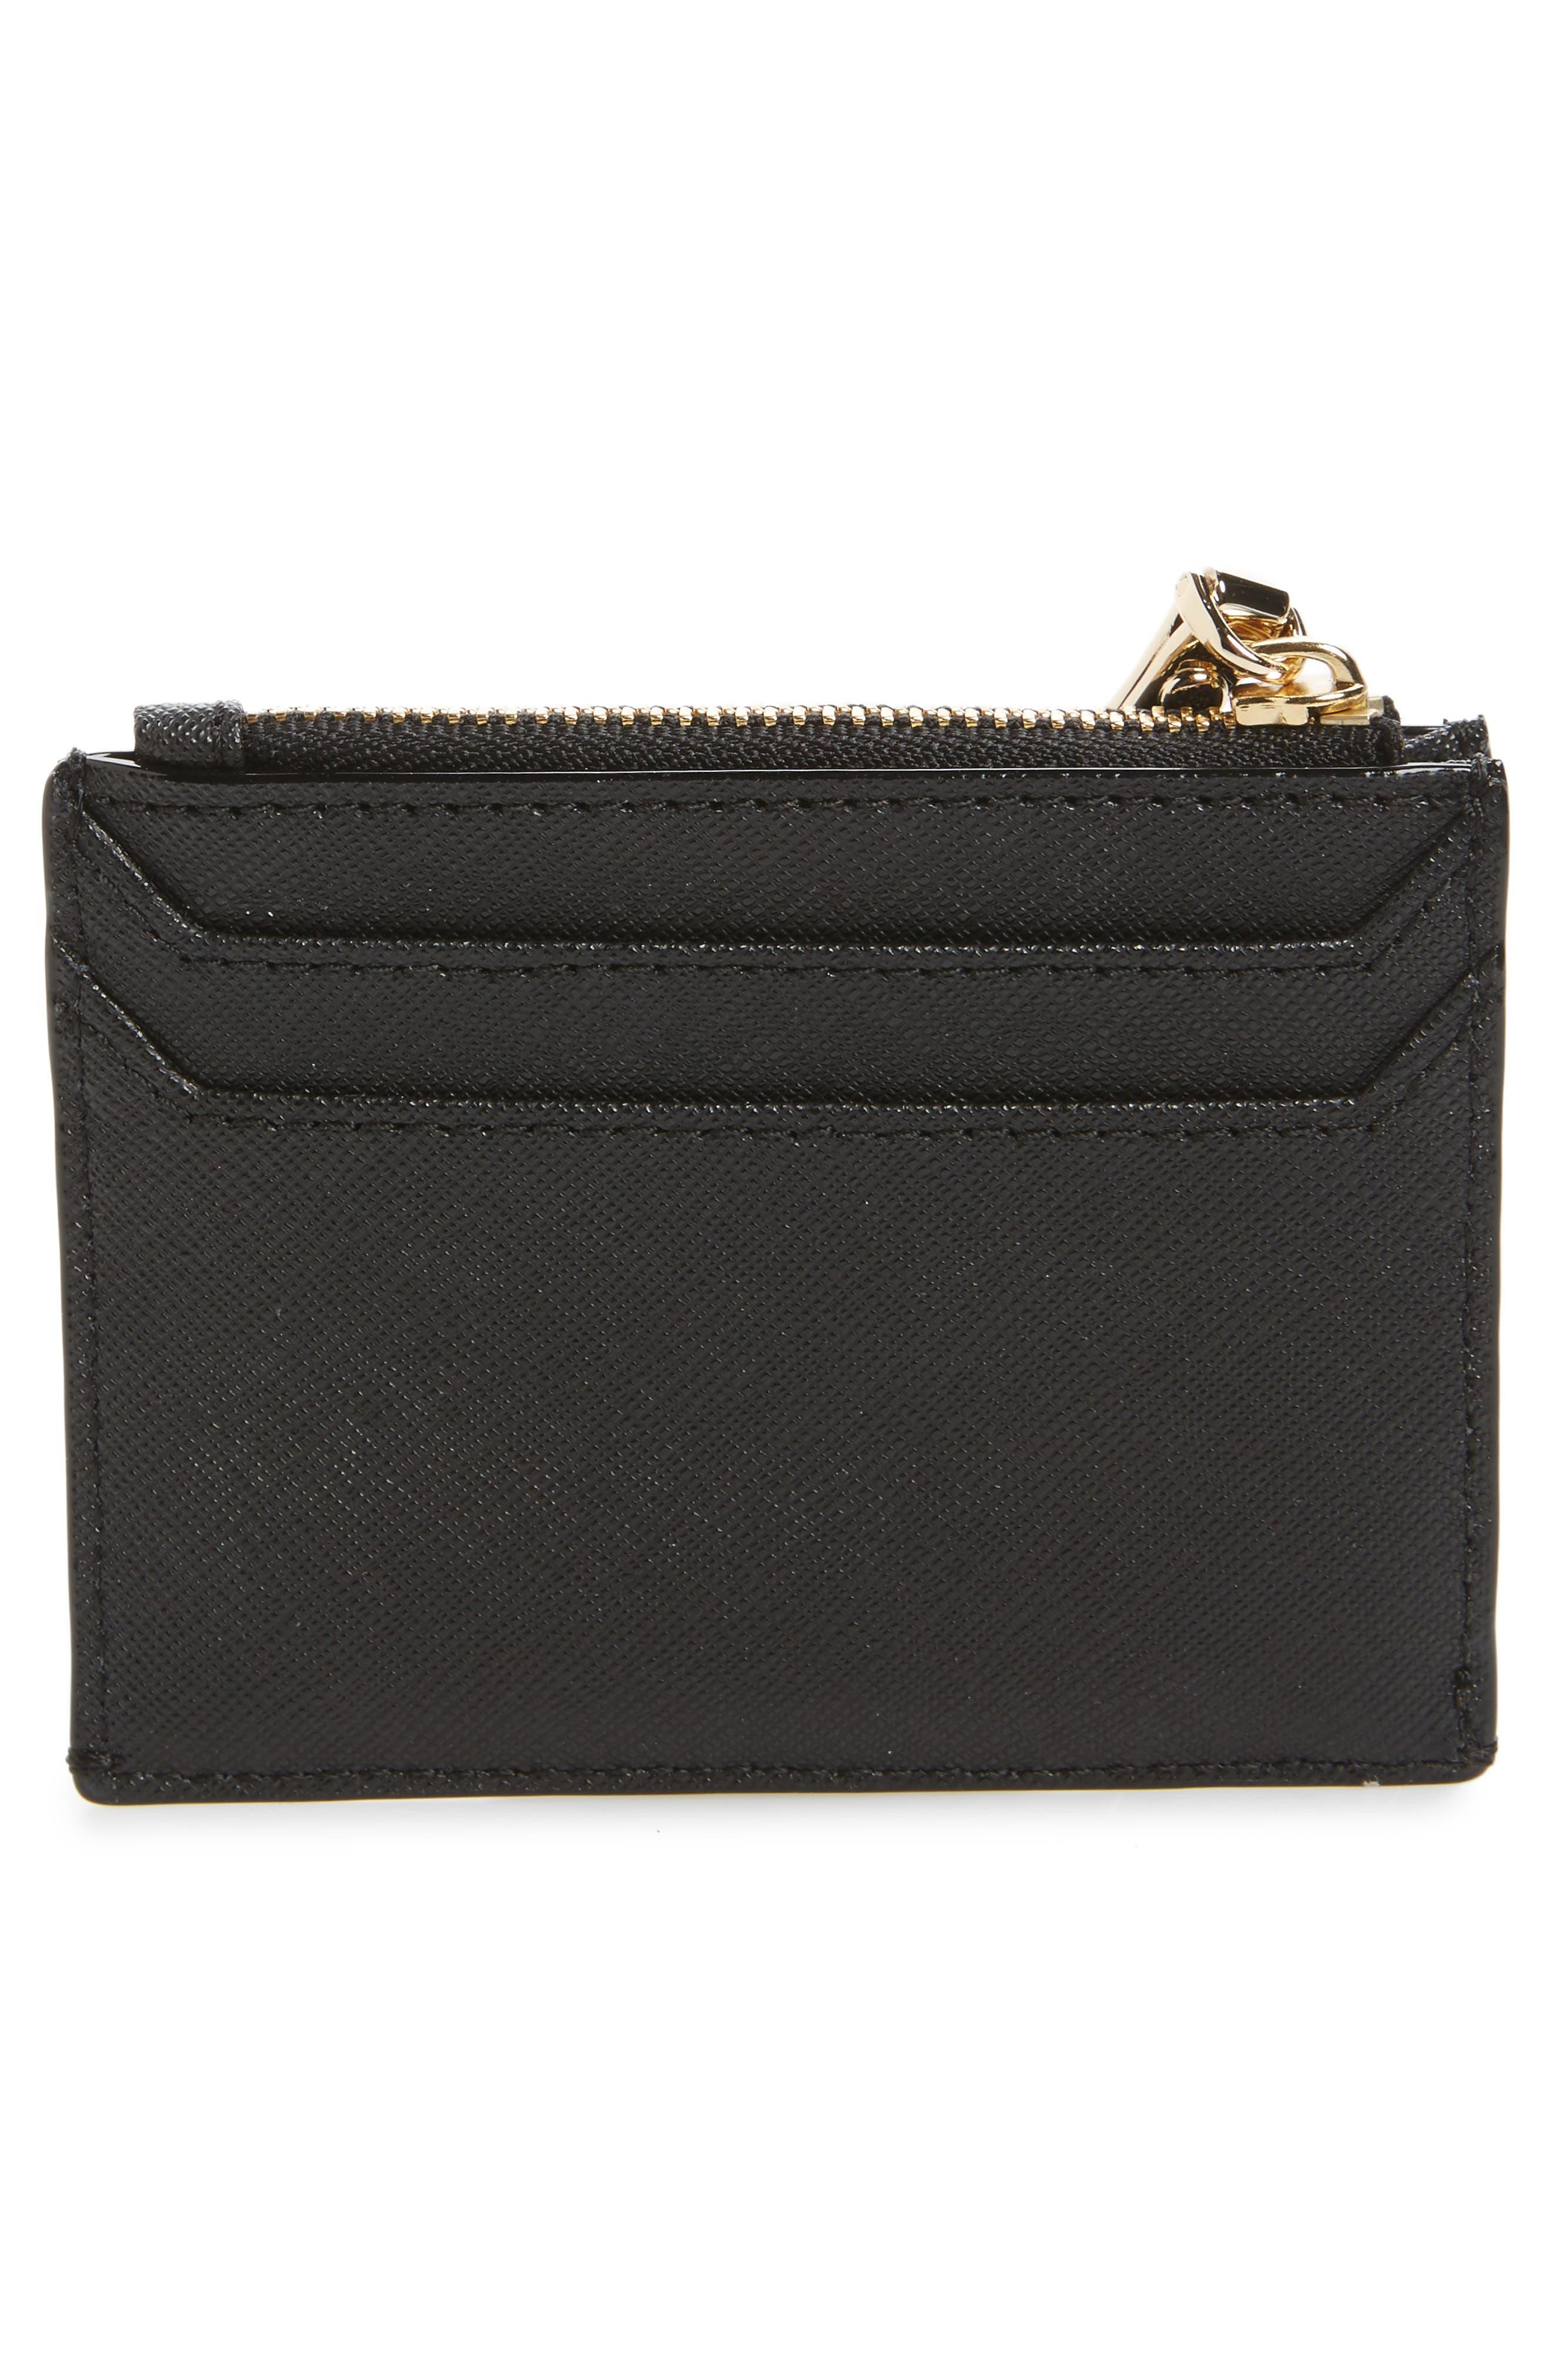 cameron street - lalena leather card case,                             Alternate thumbnail 2, color,                             001